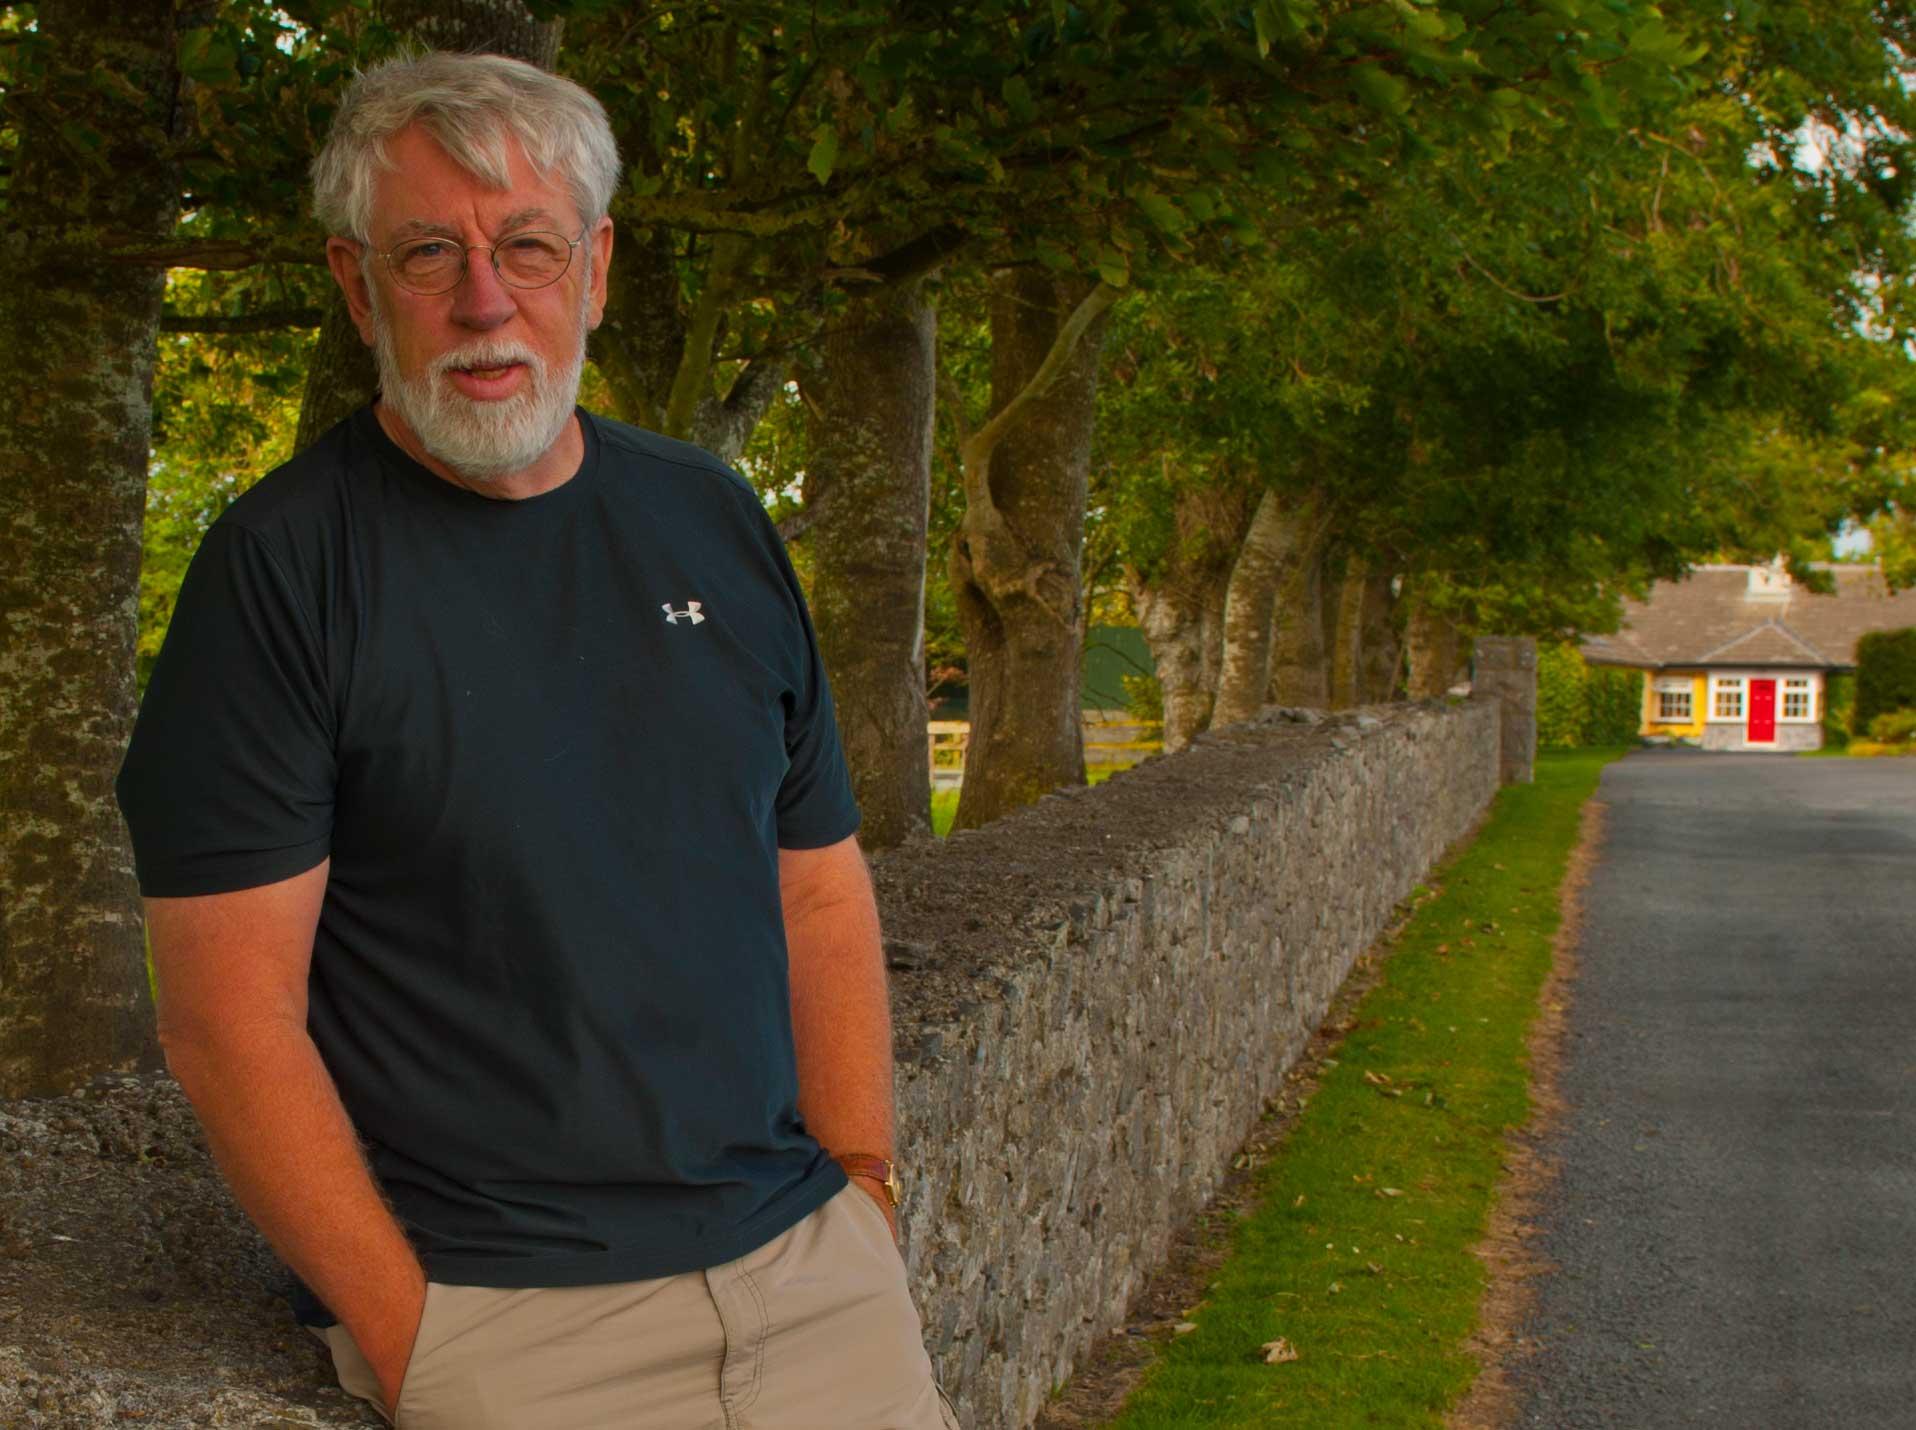 charlie in ireland